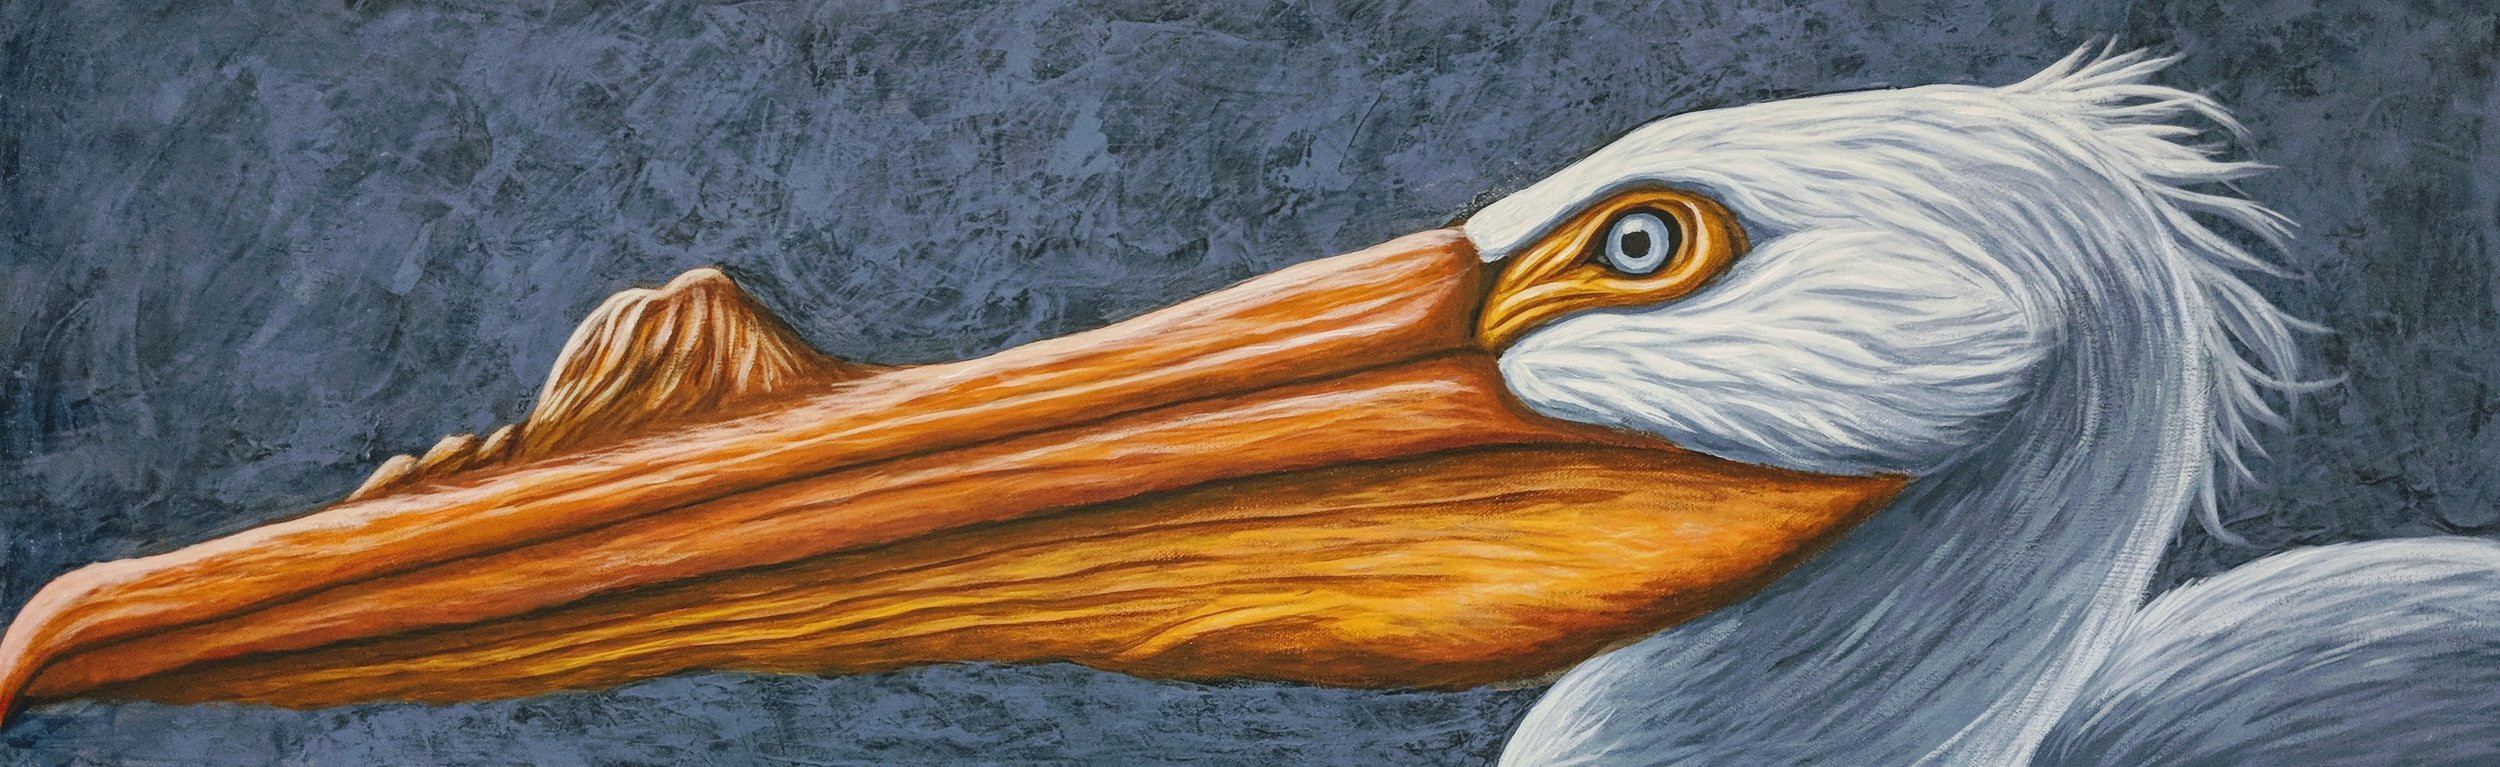 "Pelecanus erythrorhynchos  White Pelican Acrylic paint on 36""x12"" canvas"